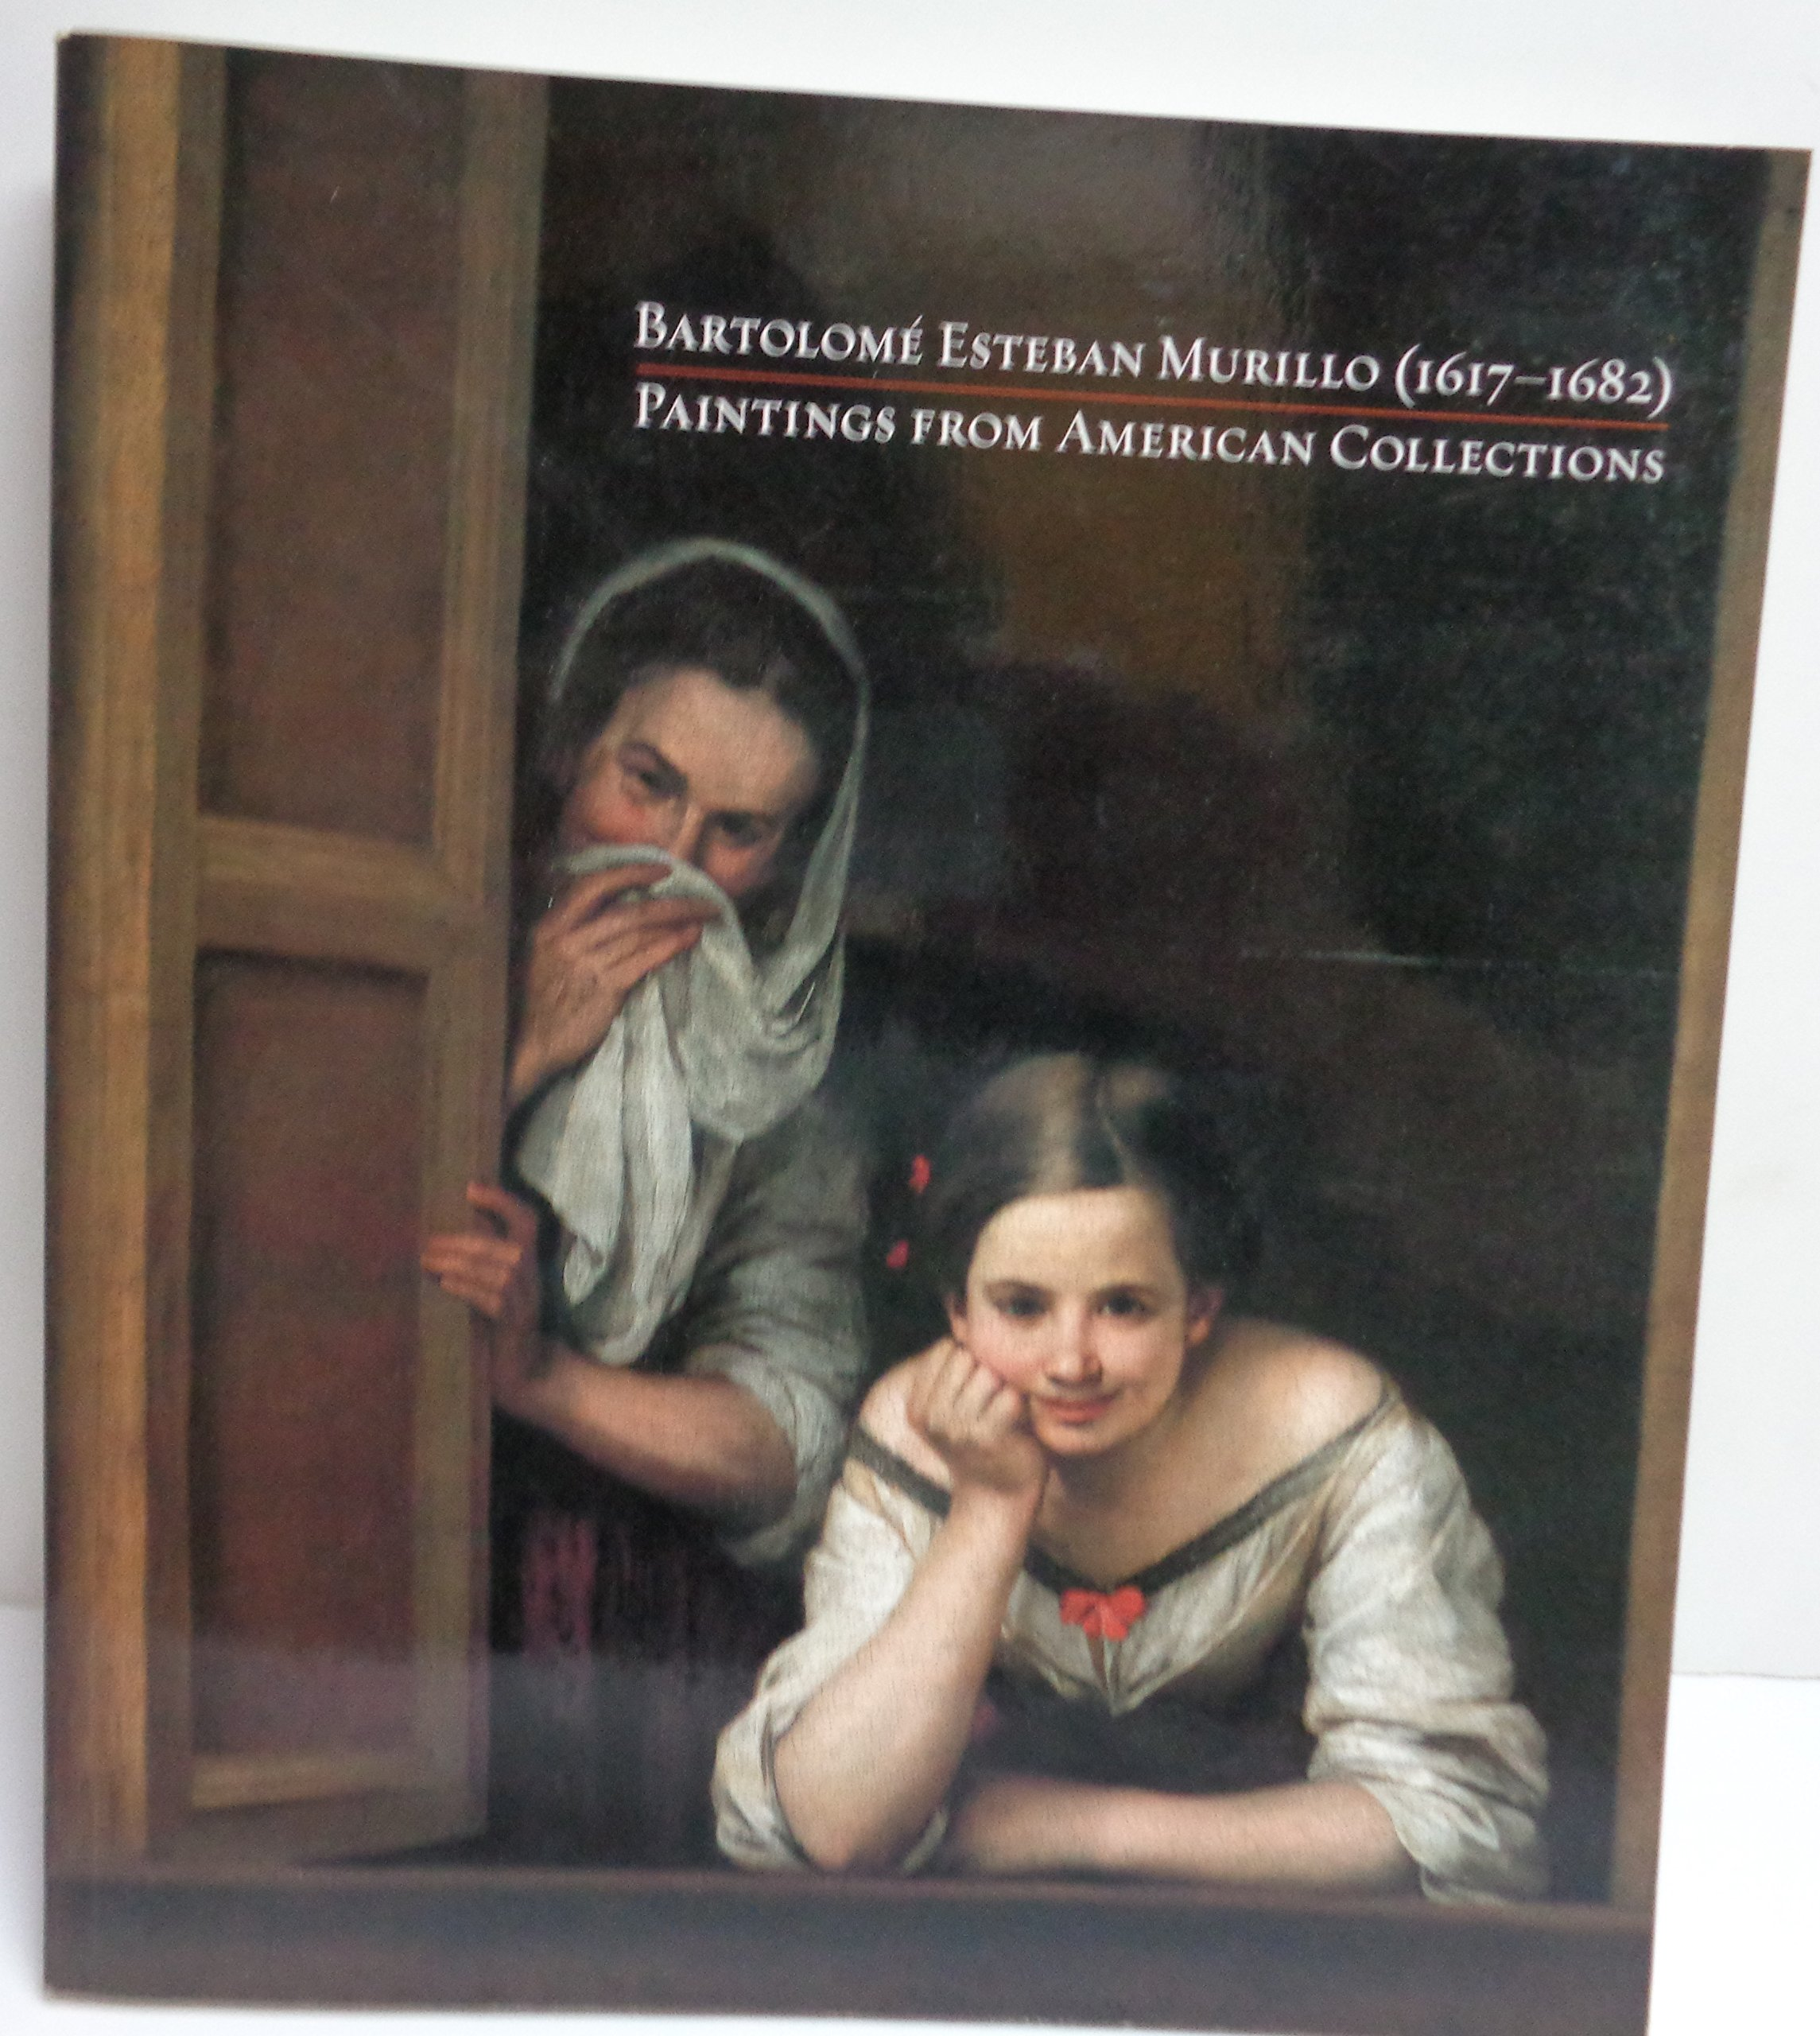 vintage biography of the artist bartolome esteban murillo